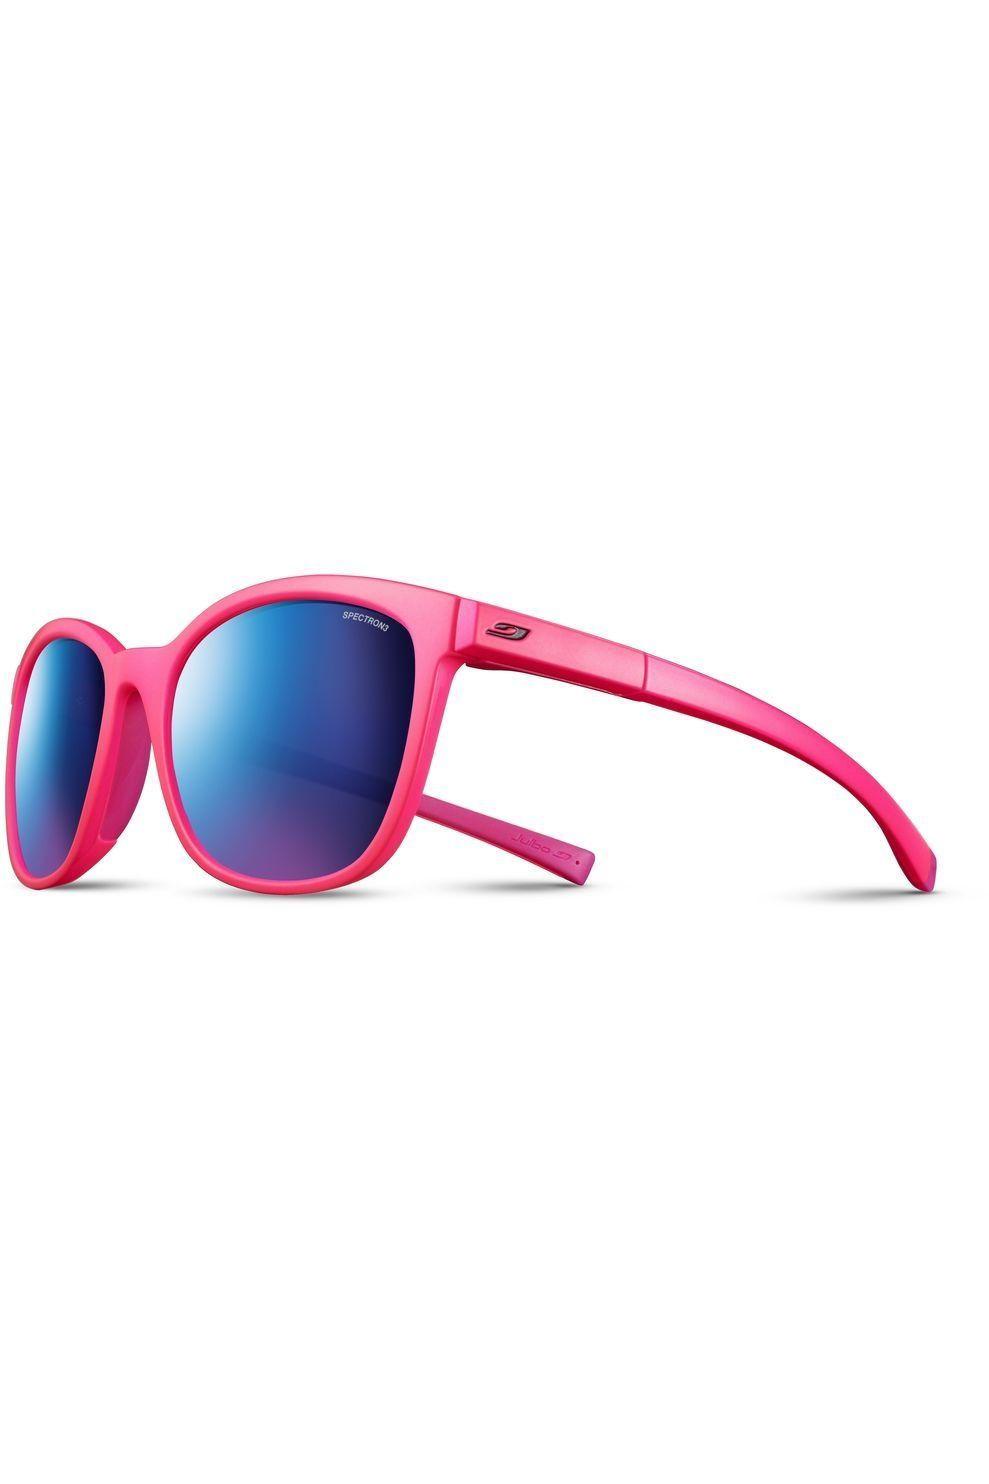 Julbo Bril Spark voor dames - Roze